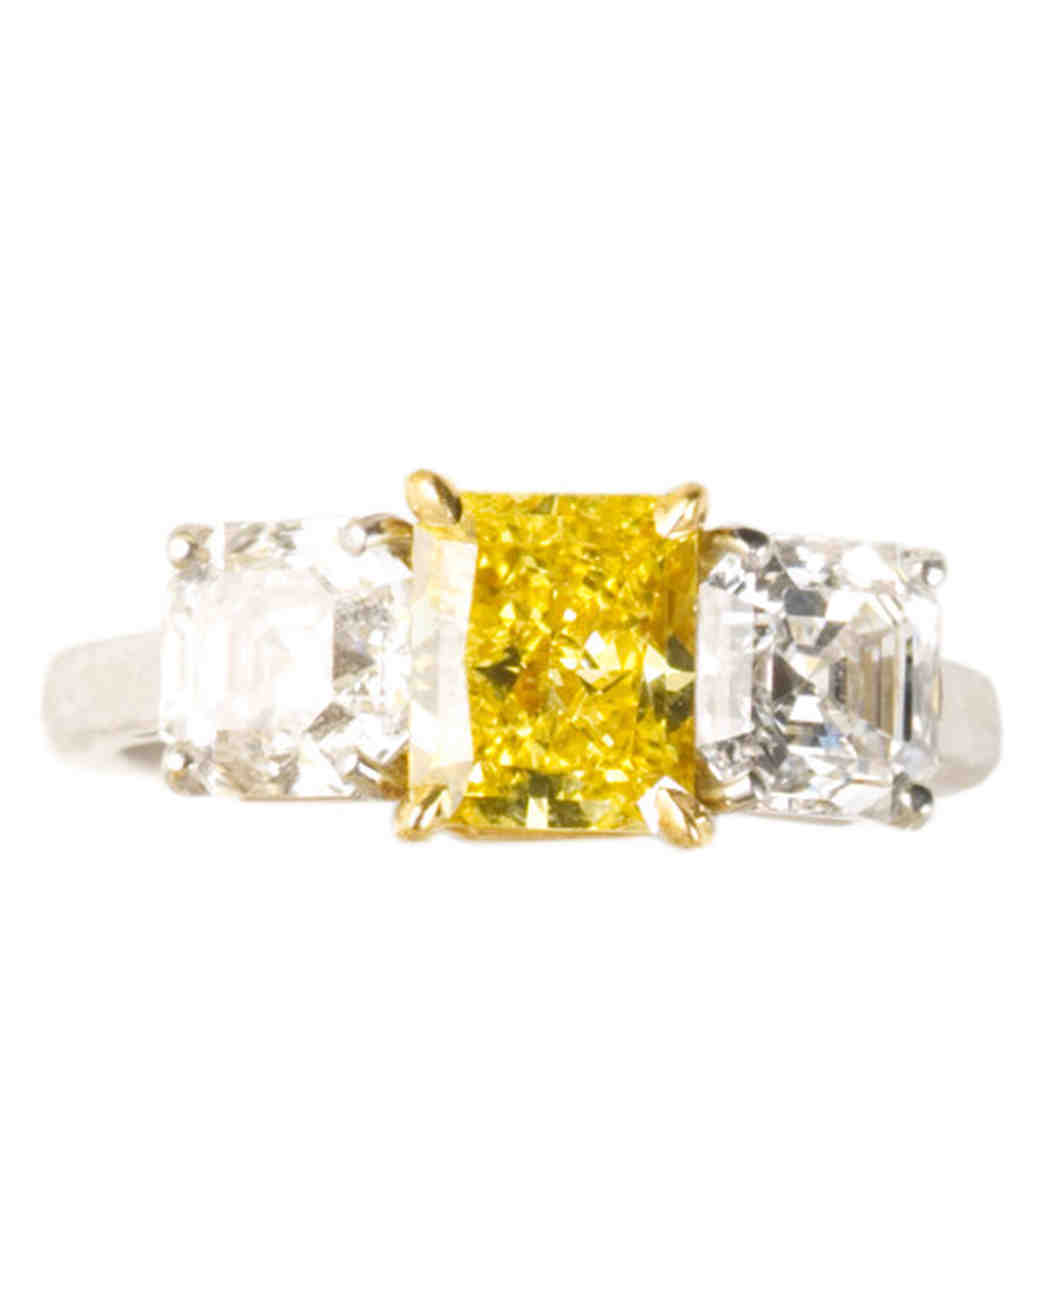 msw_sum10_yellow_ring_ivankatrump1.jpg